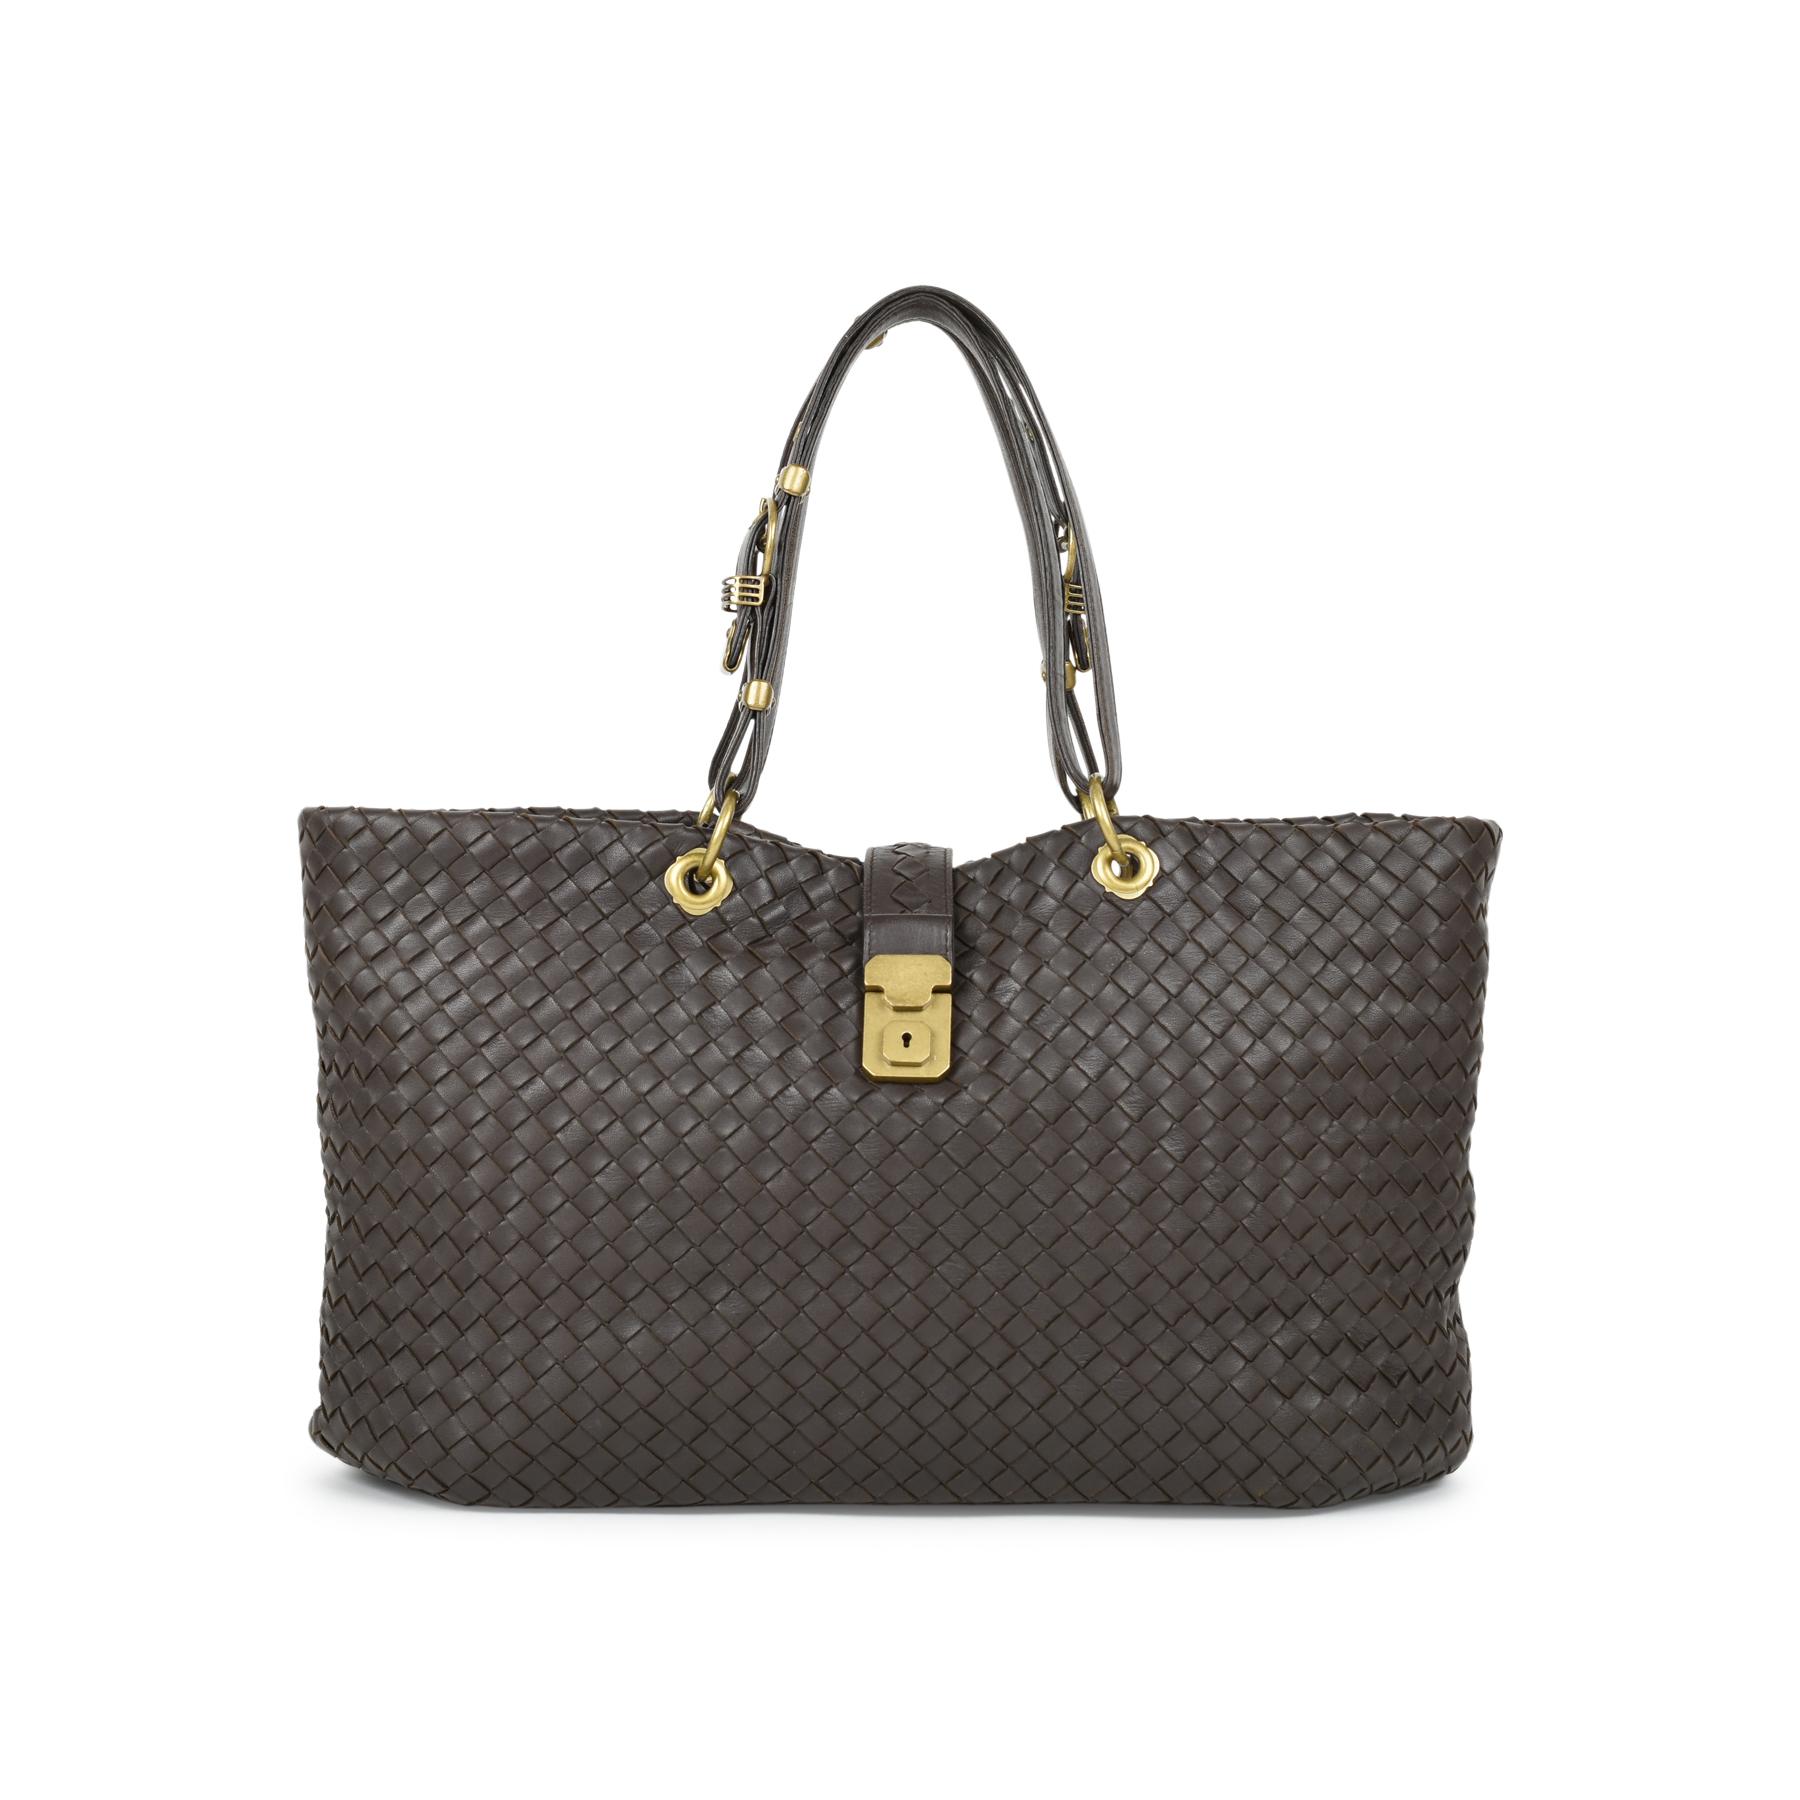 3b917eff6d Authentic Second Hand Bottega Veneta Intrecciato Woven Nappa Capri Tote Bag  (PSS-472-00008)